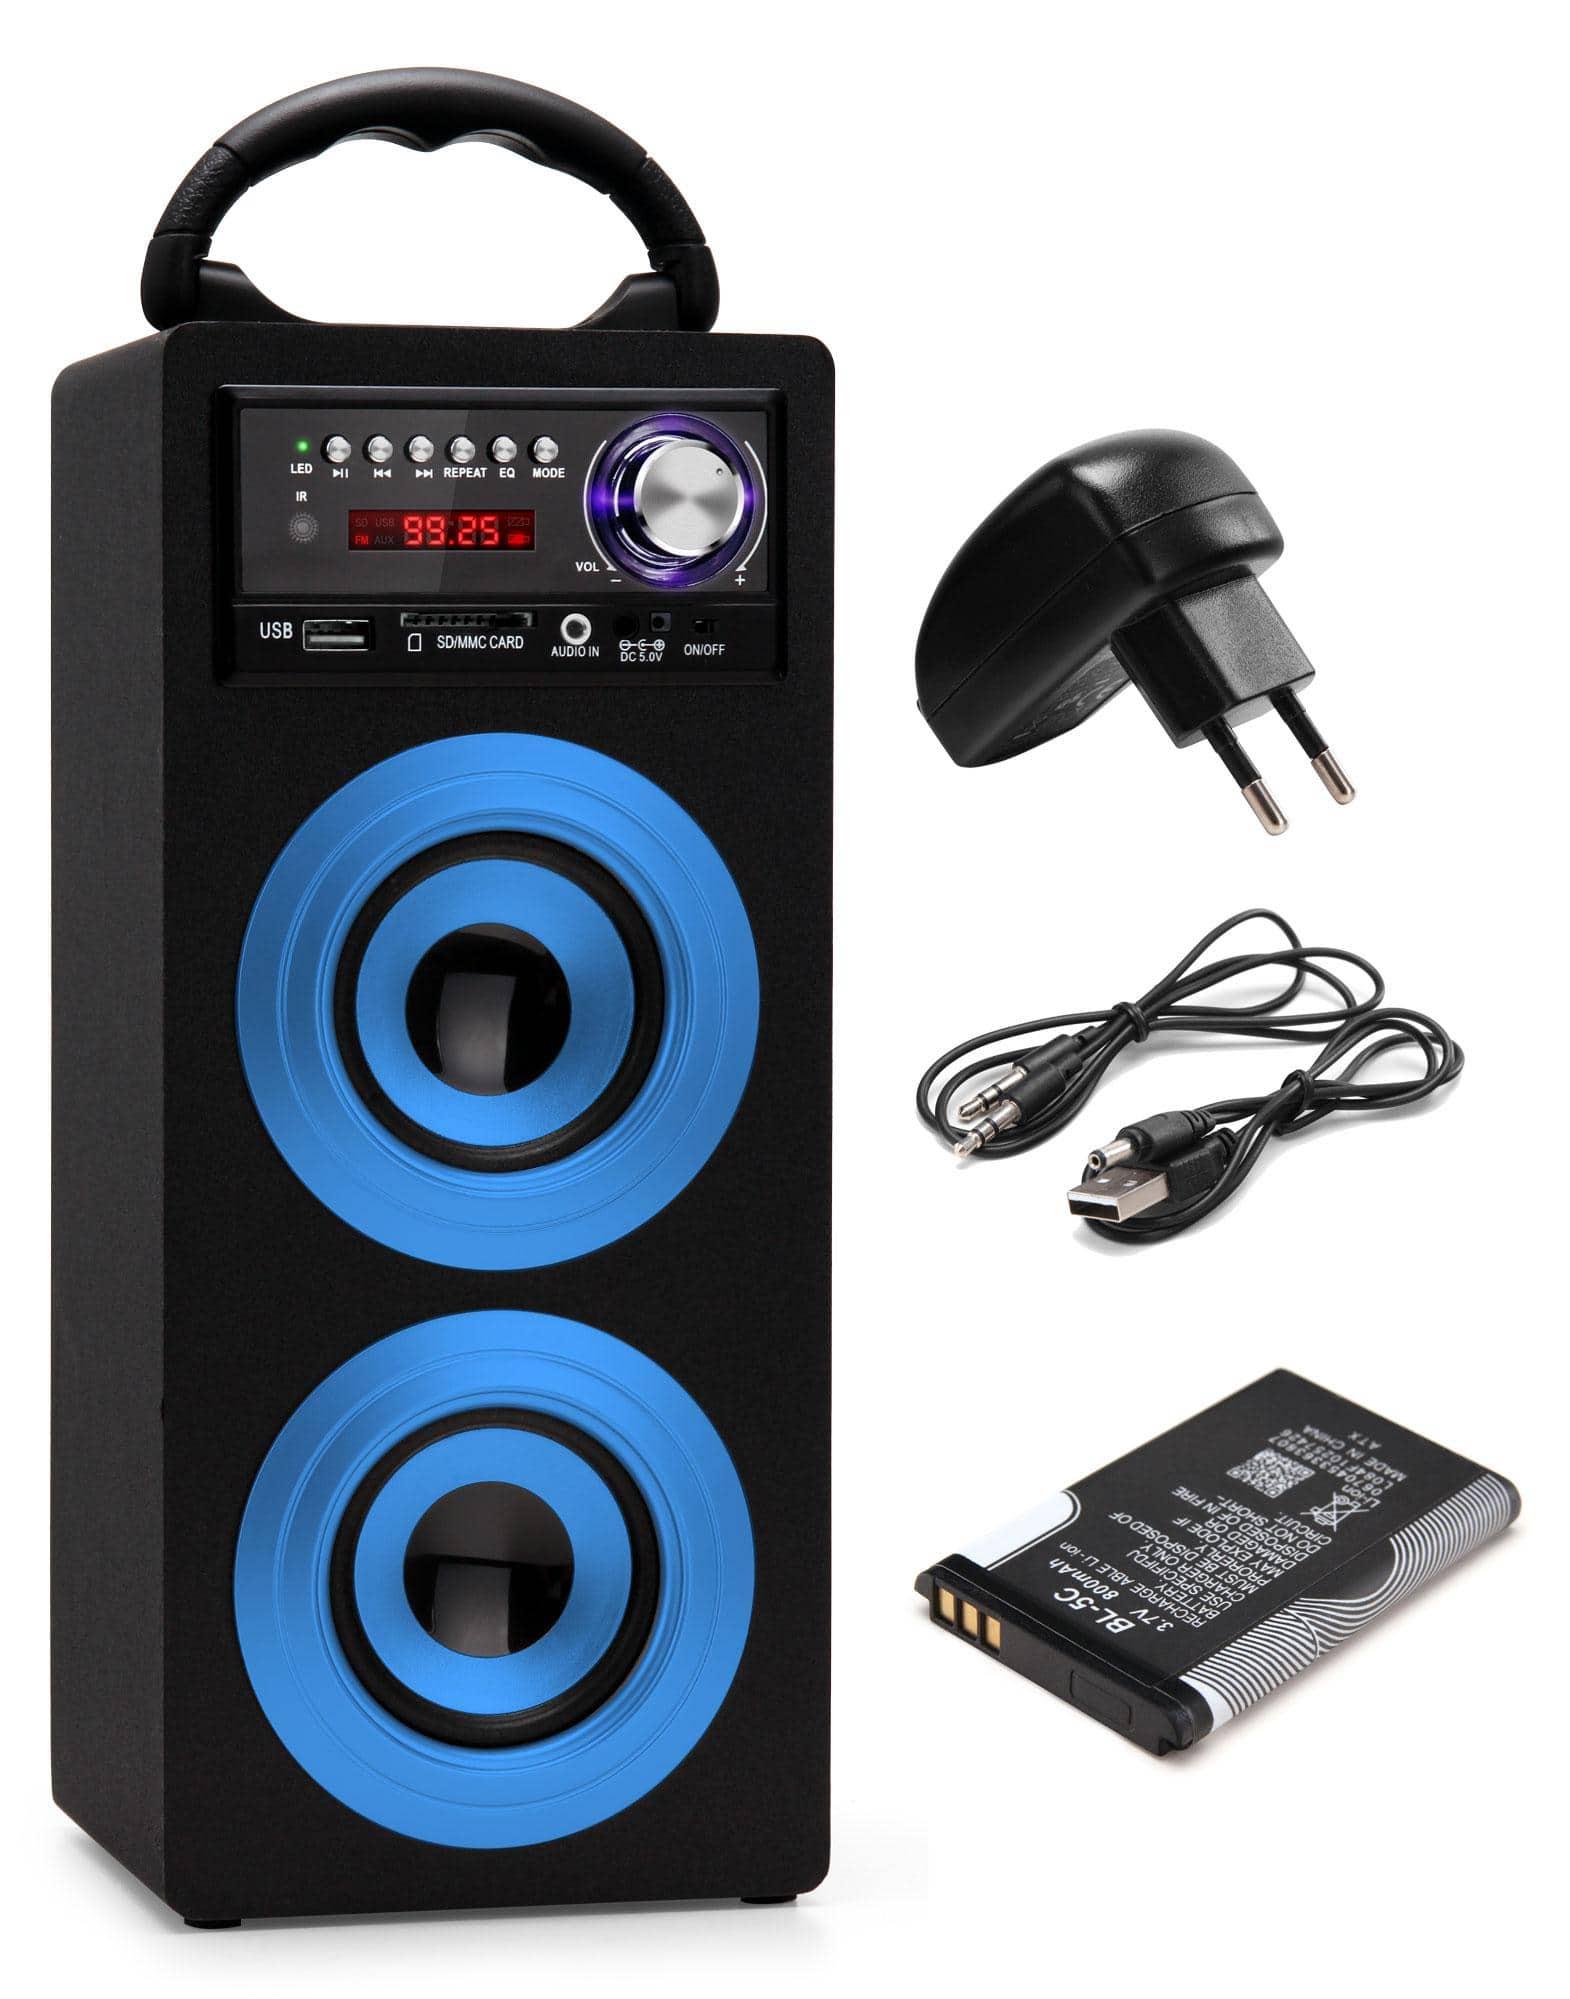 Beatfoxx Beachside Portable Bluetooth Speaker Usb Sd Aux Fm Blue Remote Control Circuit Using A Radio Electronic Set Incl Battery Power Cord